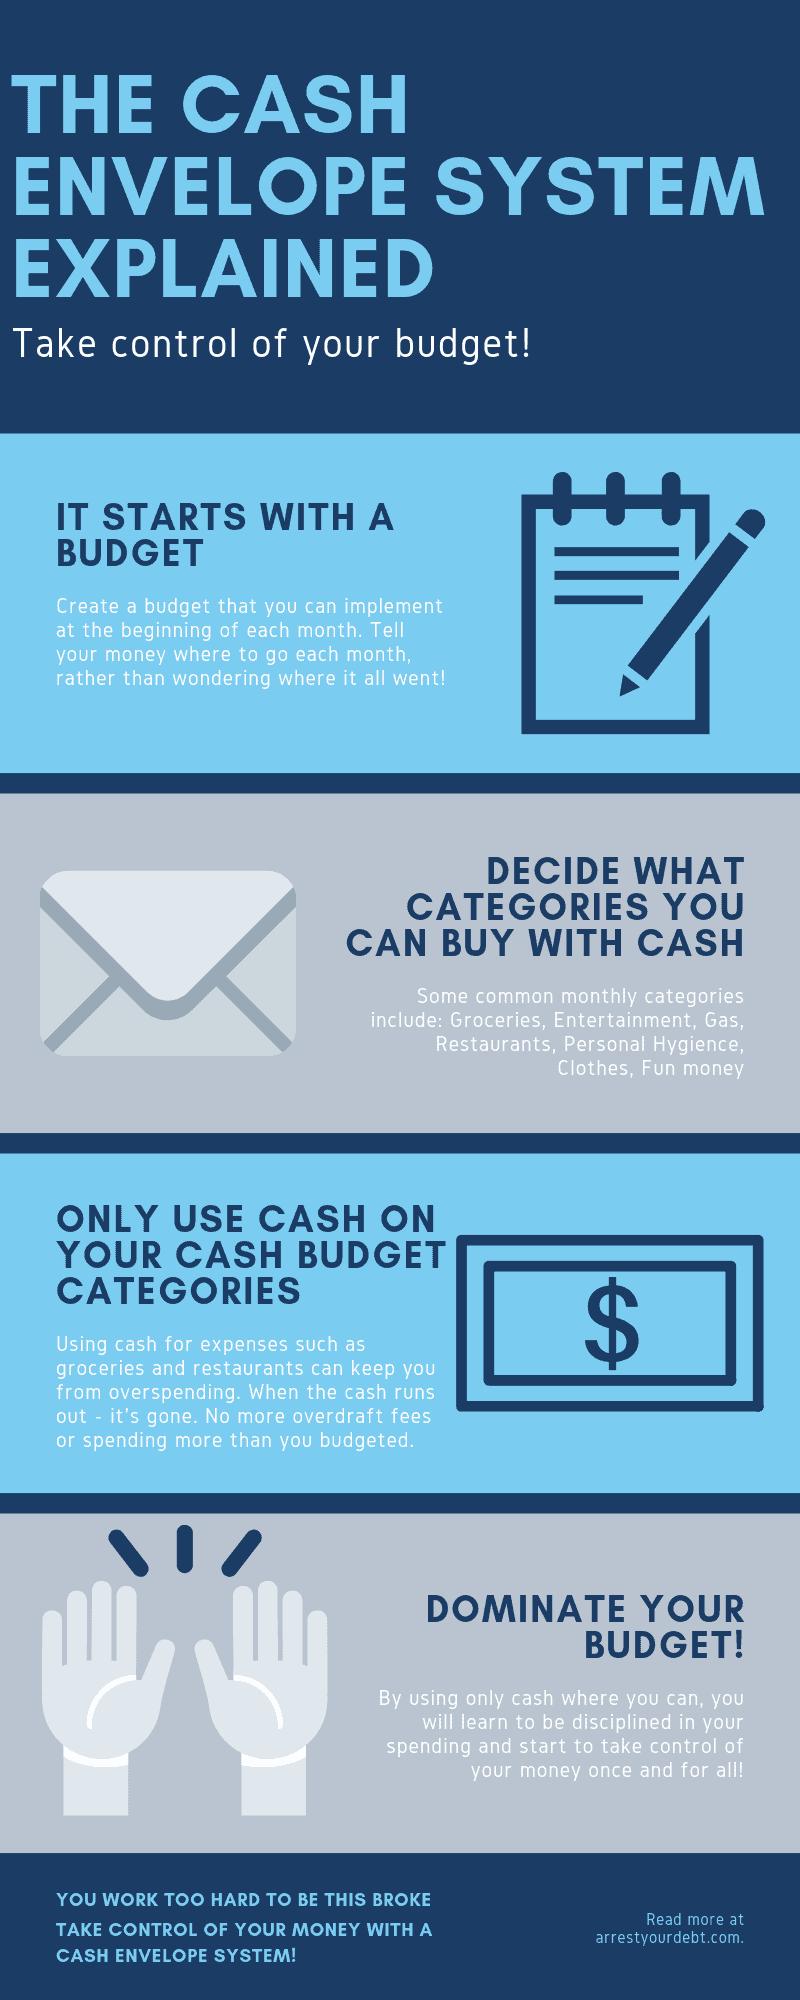 The Cash envelope system explained